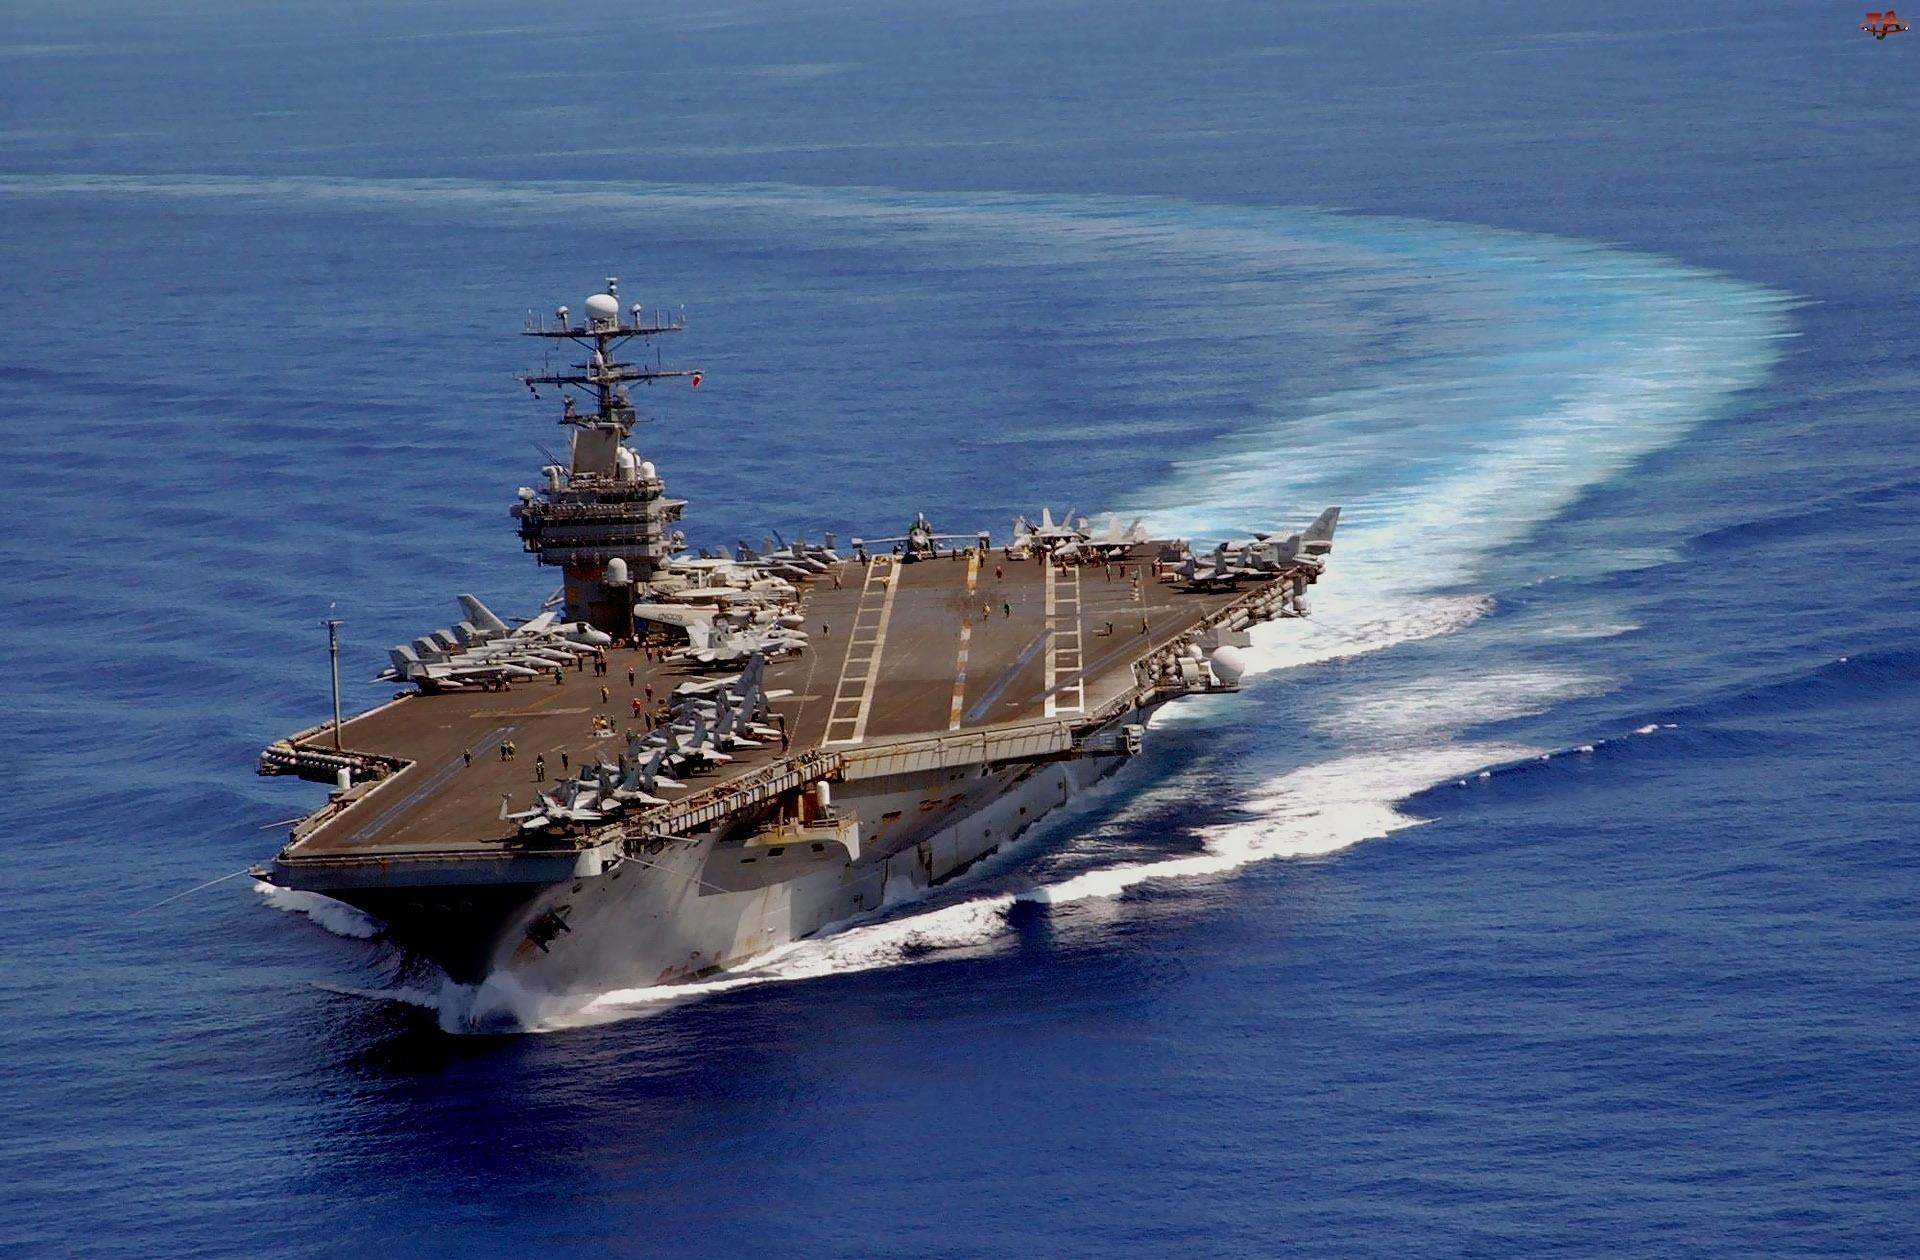 USS Carl Vinson, Lotniskowiec, Atomowy